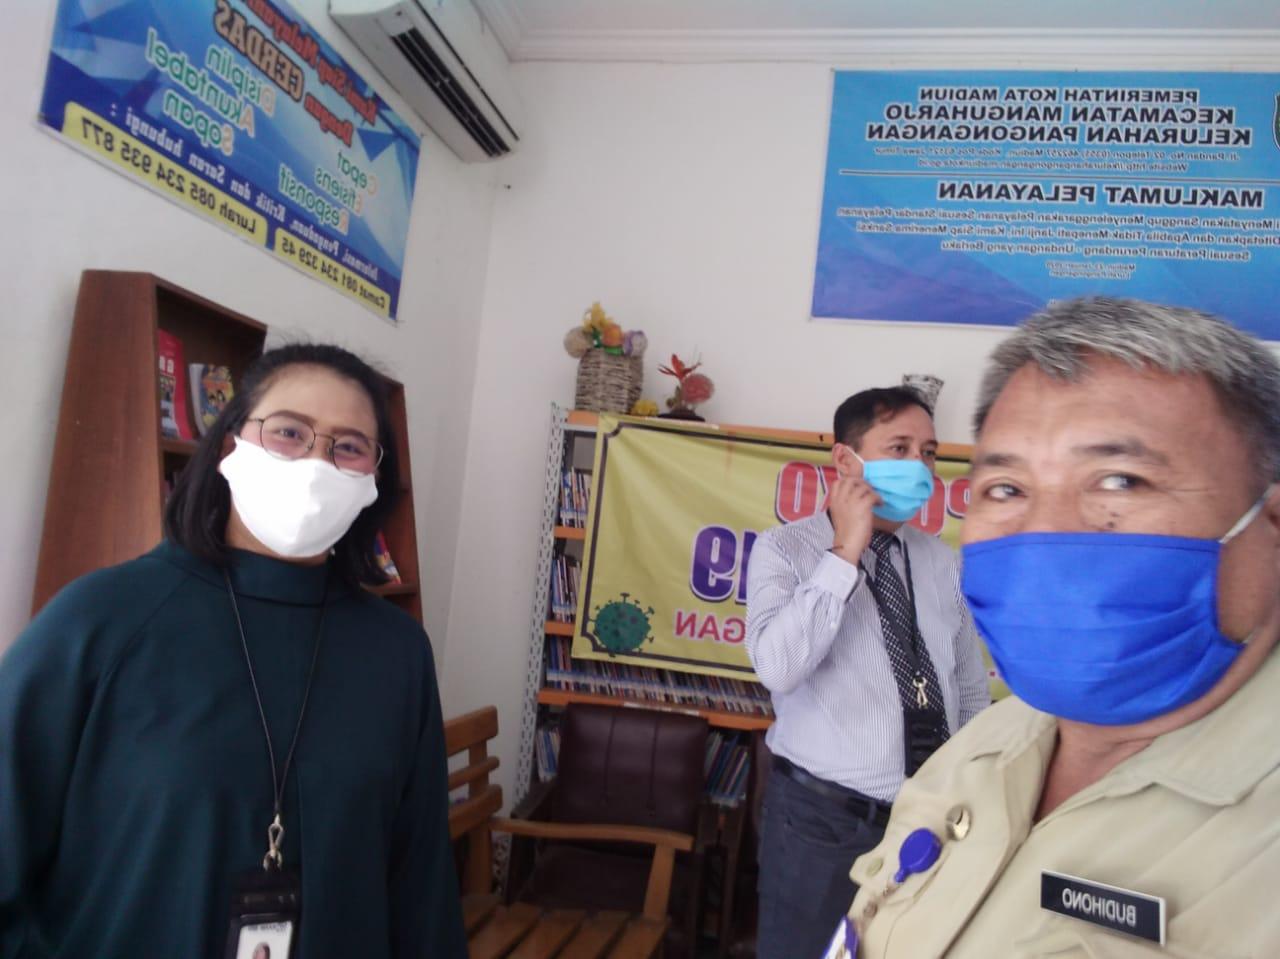 Masker Dan APD Untuk Pangongangan